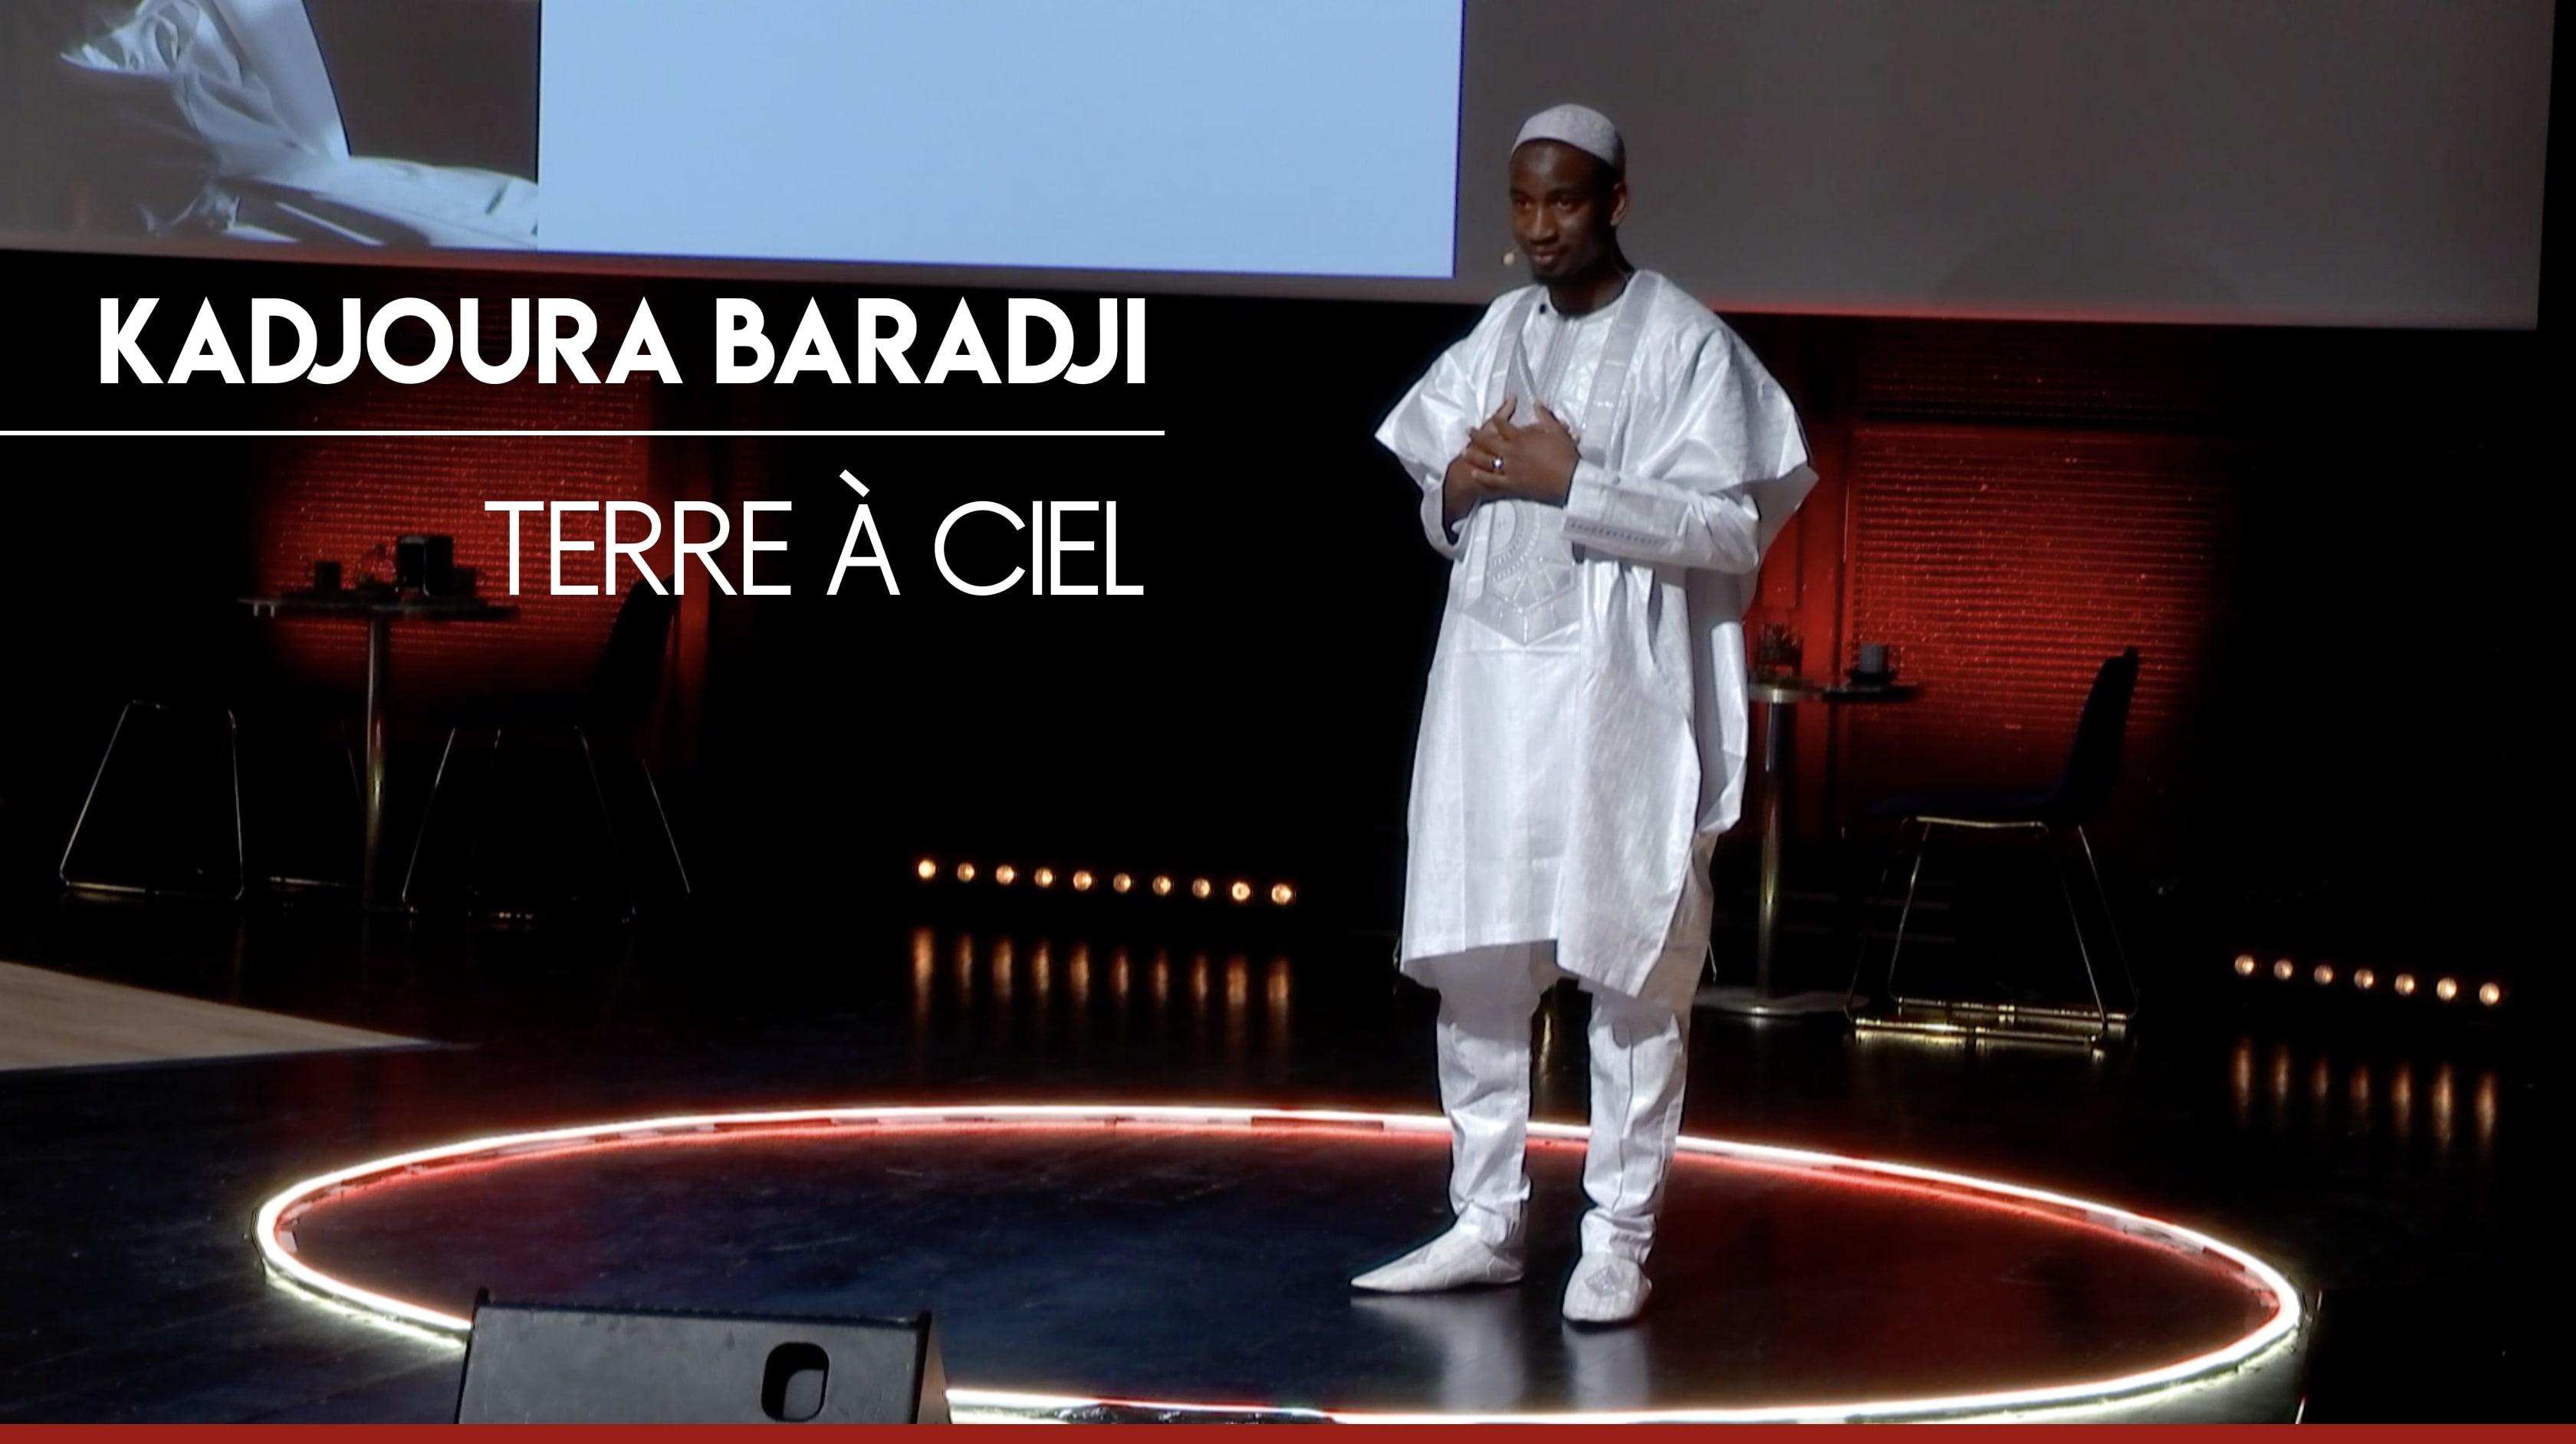 Kadjoura Baradji